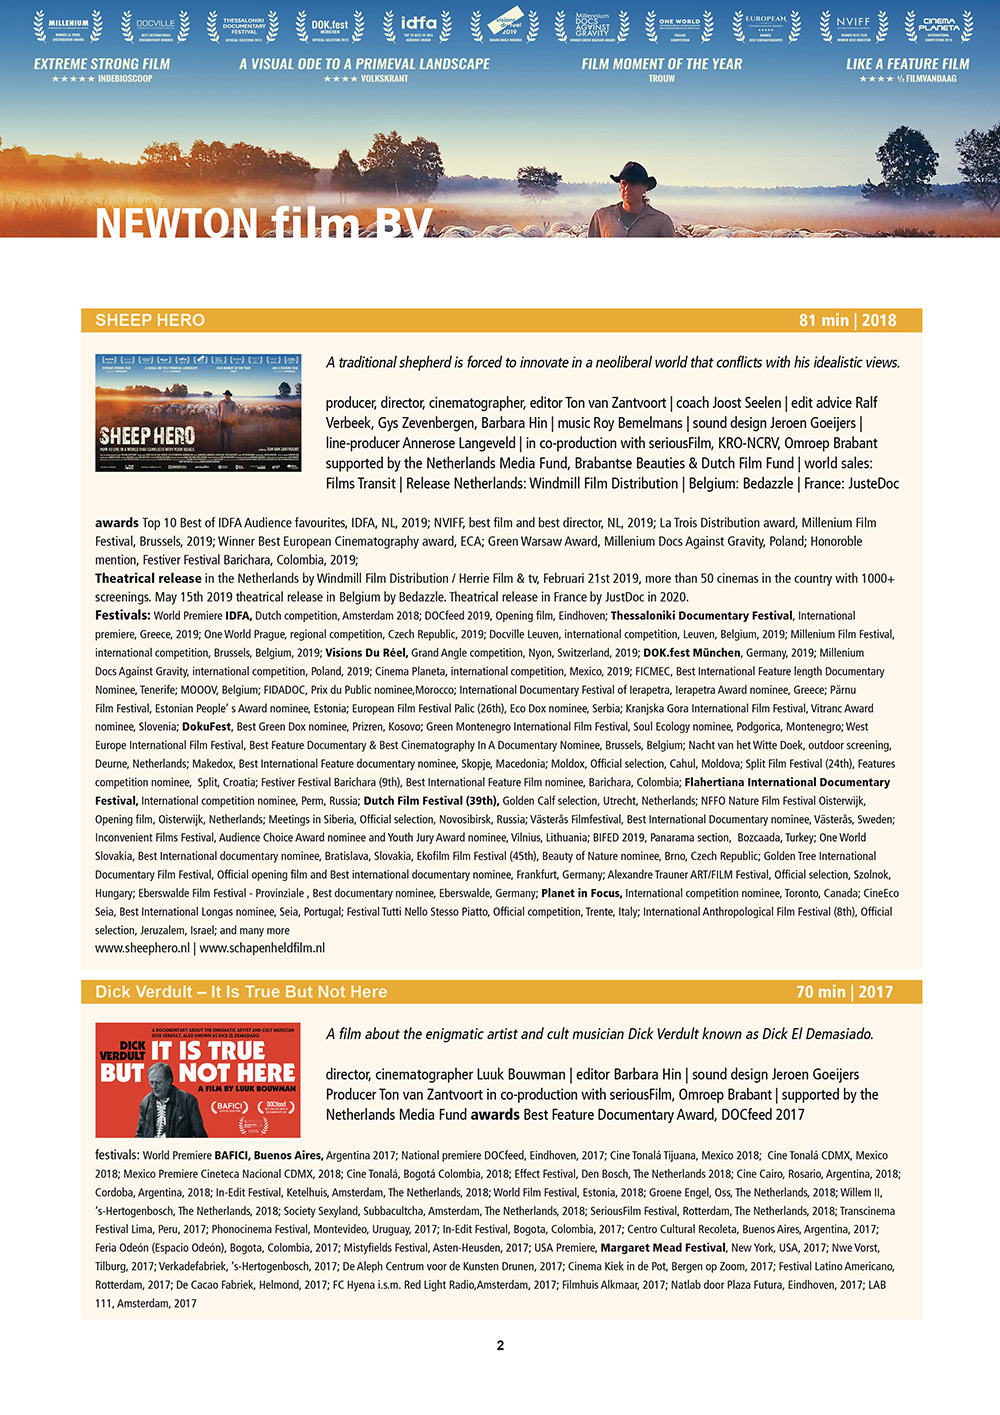 NEWTON-film-cv-page-2of5